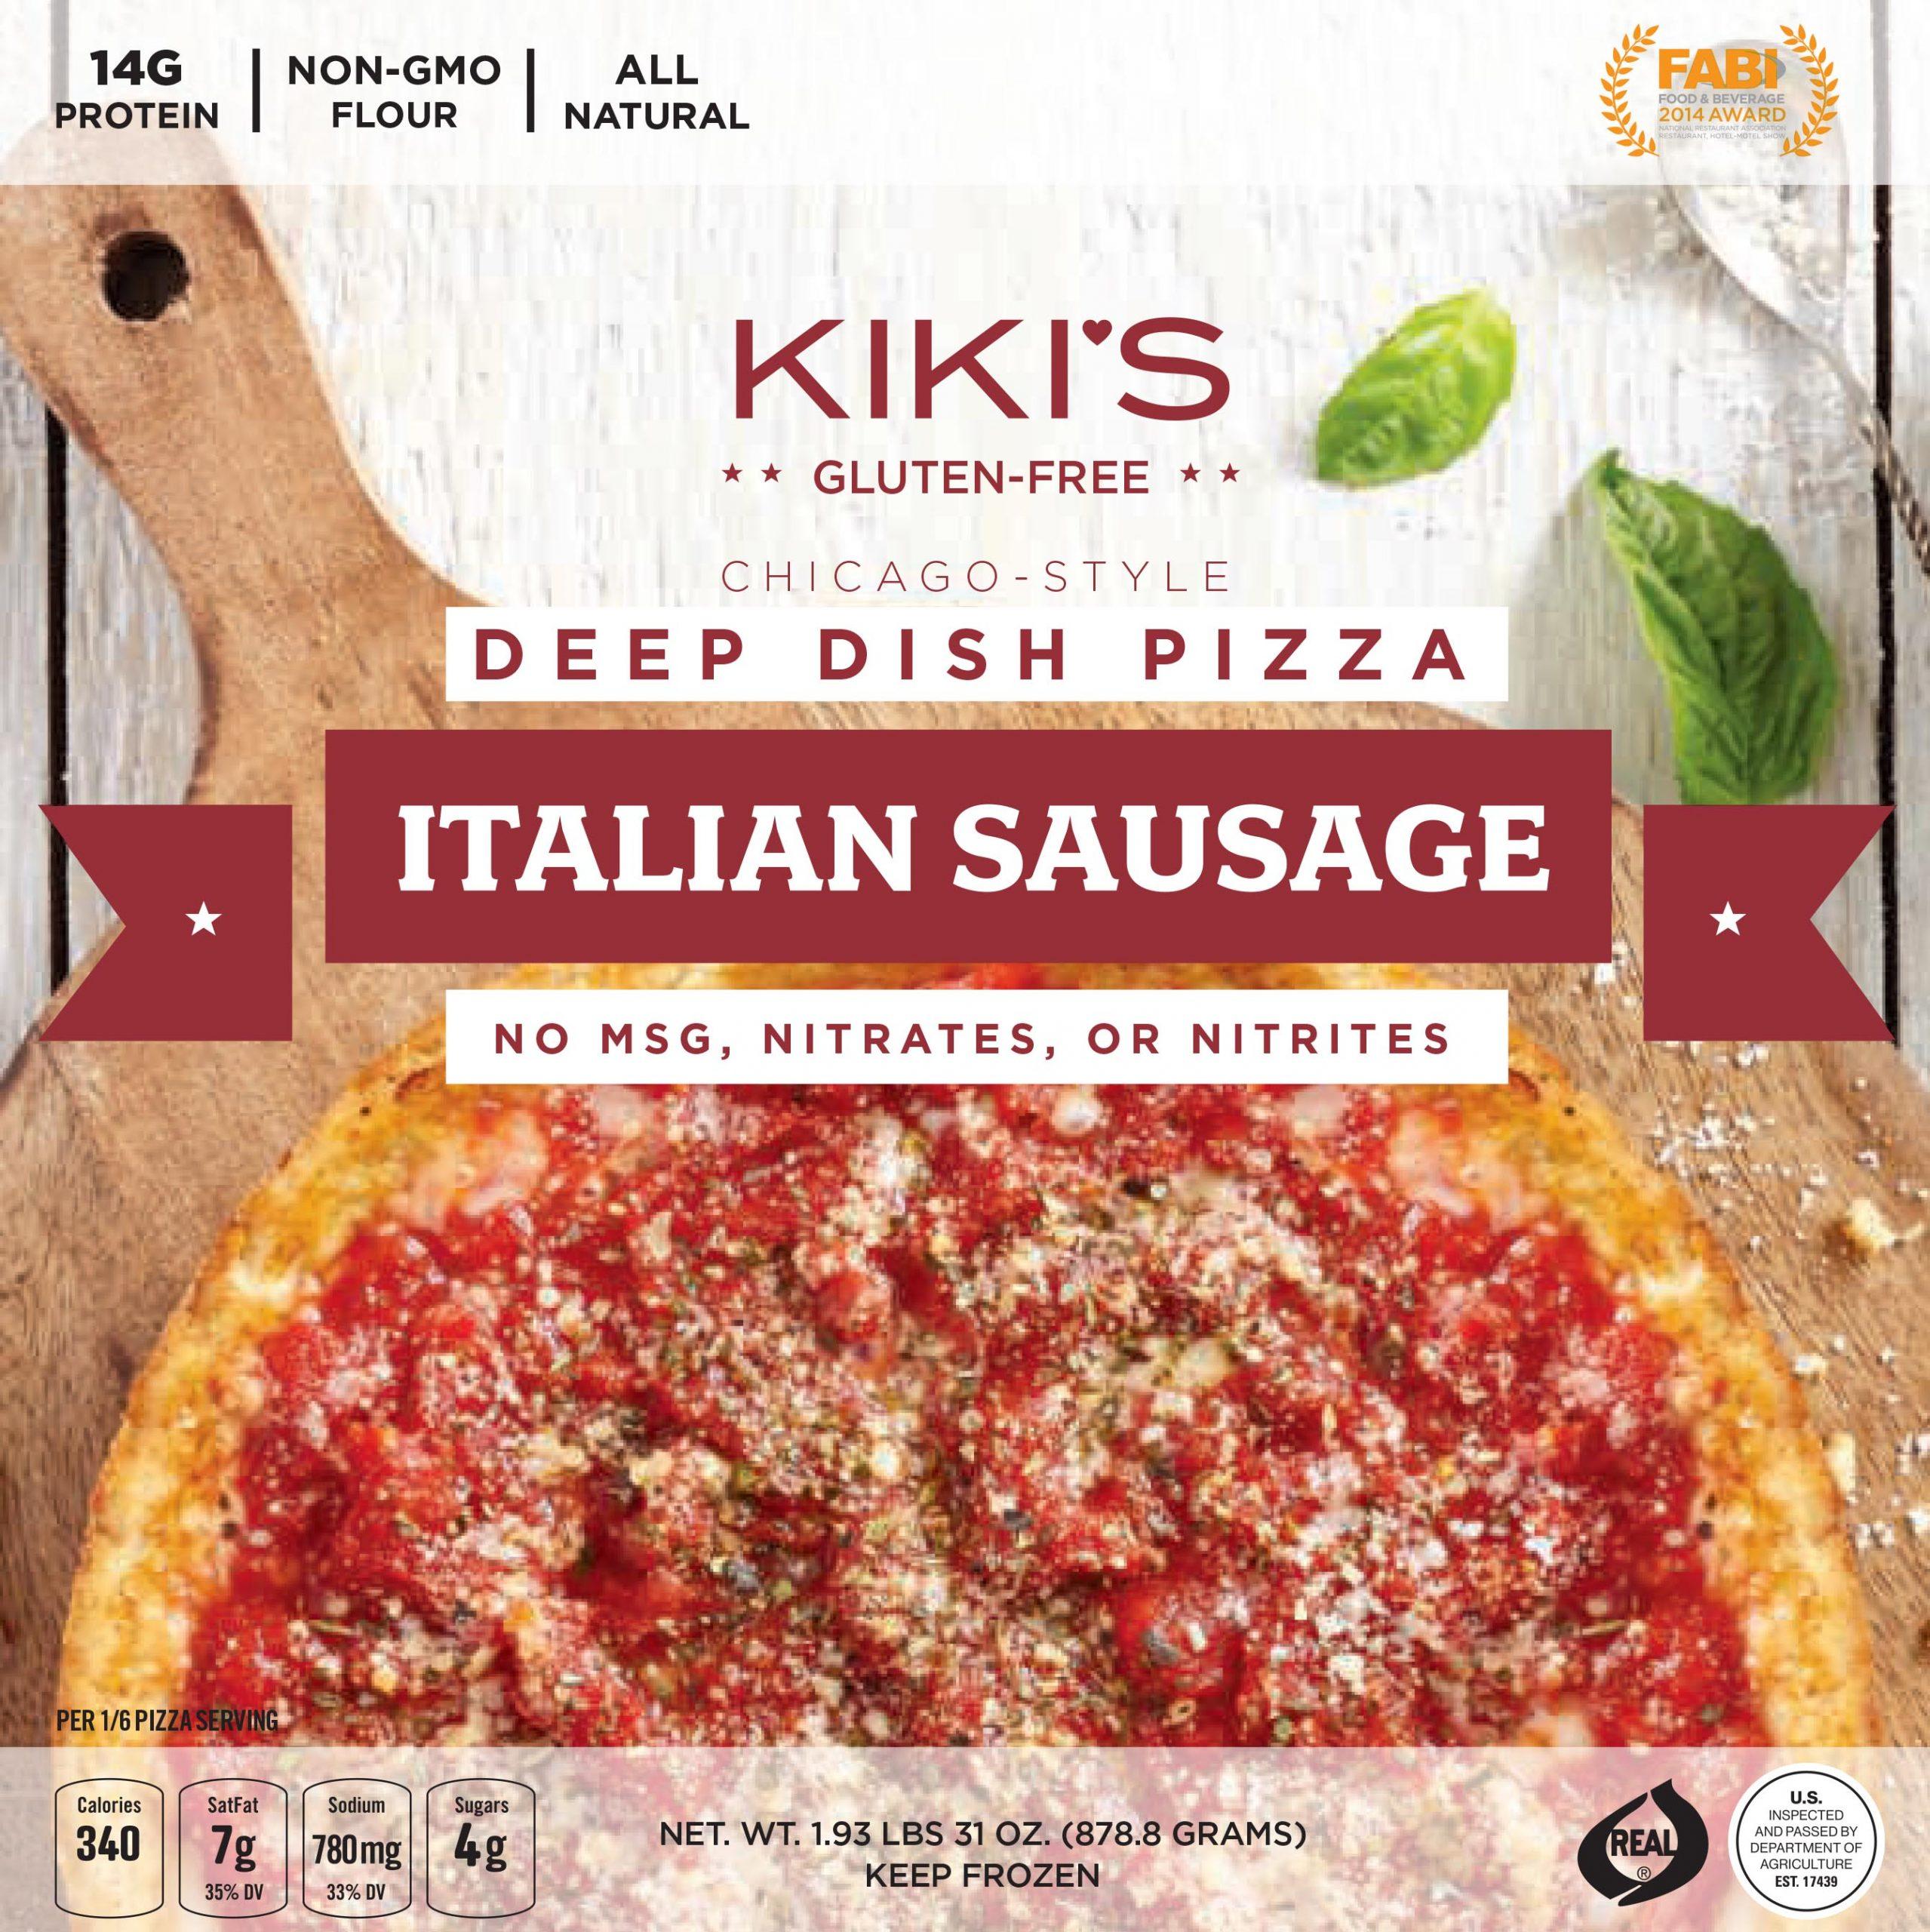 Kiki's Italian Sausage Deep Dish Pizza Box Top